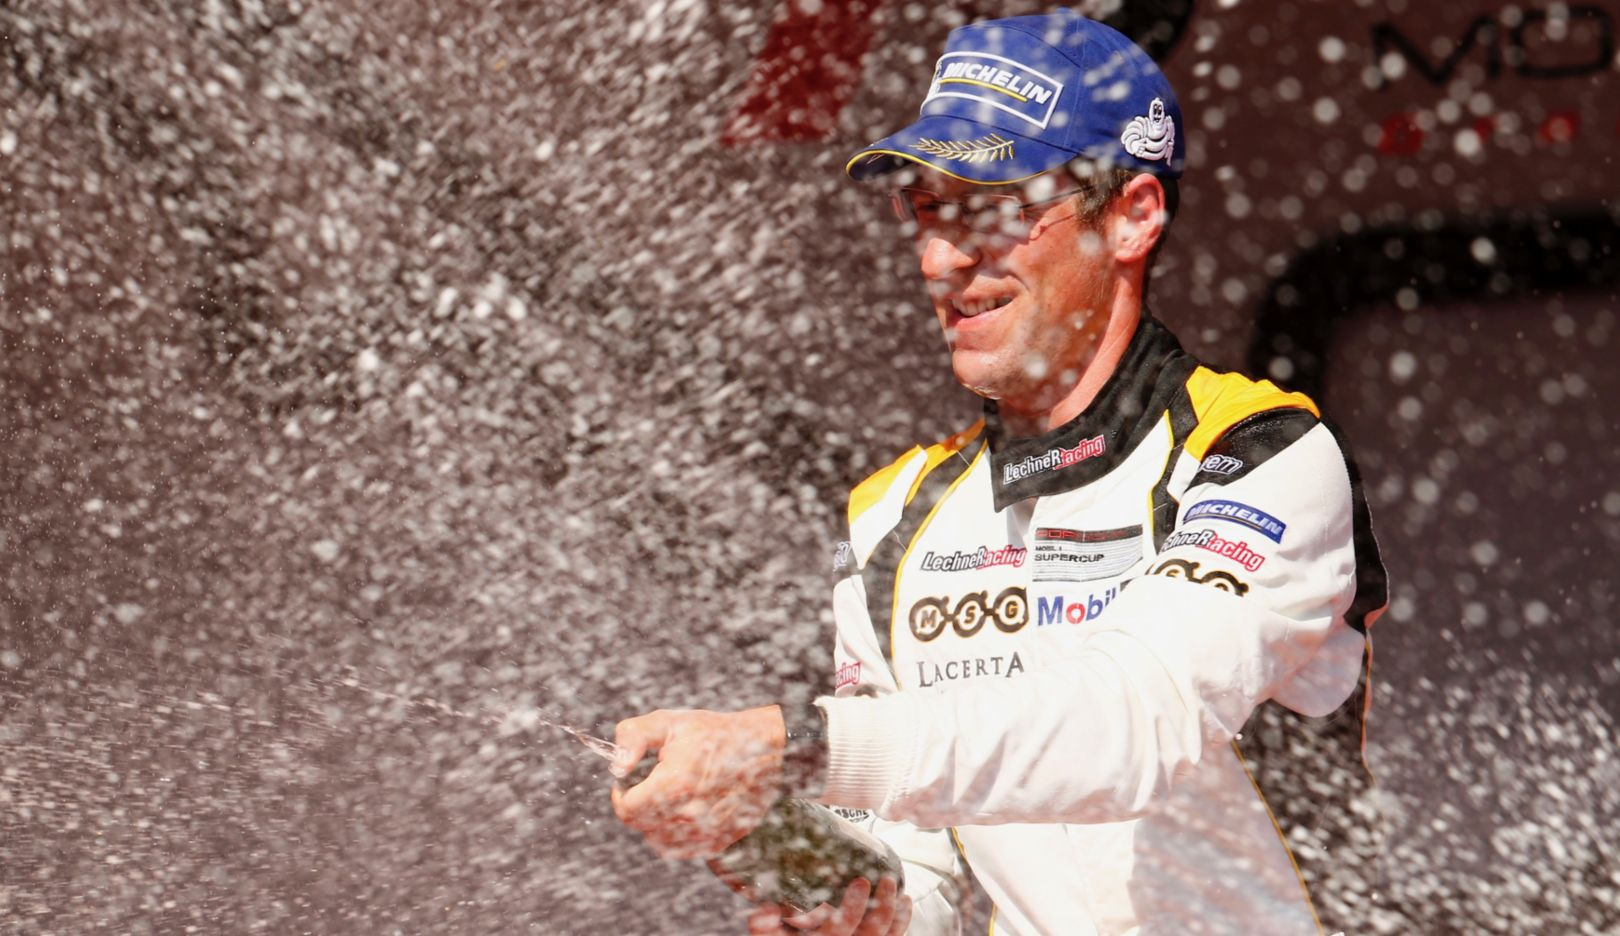 Michael Ammermüller, Monaco, Porsche Mobil 1 Supercup, 2017, Porsche AG